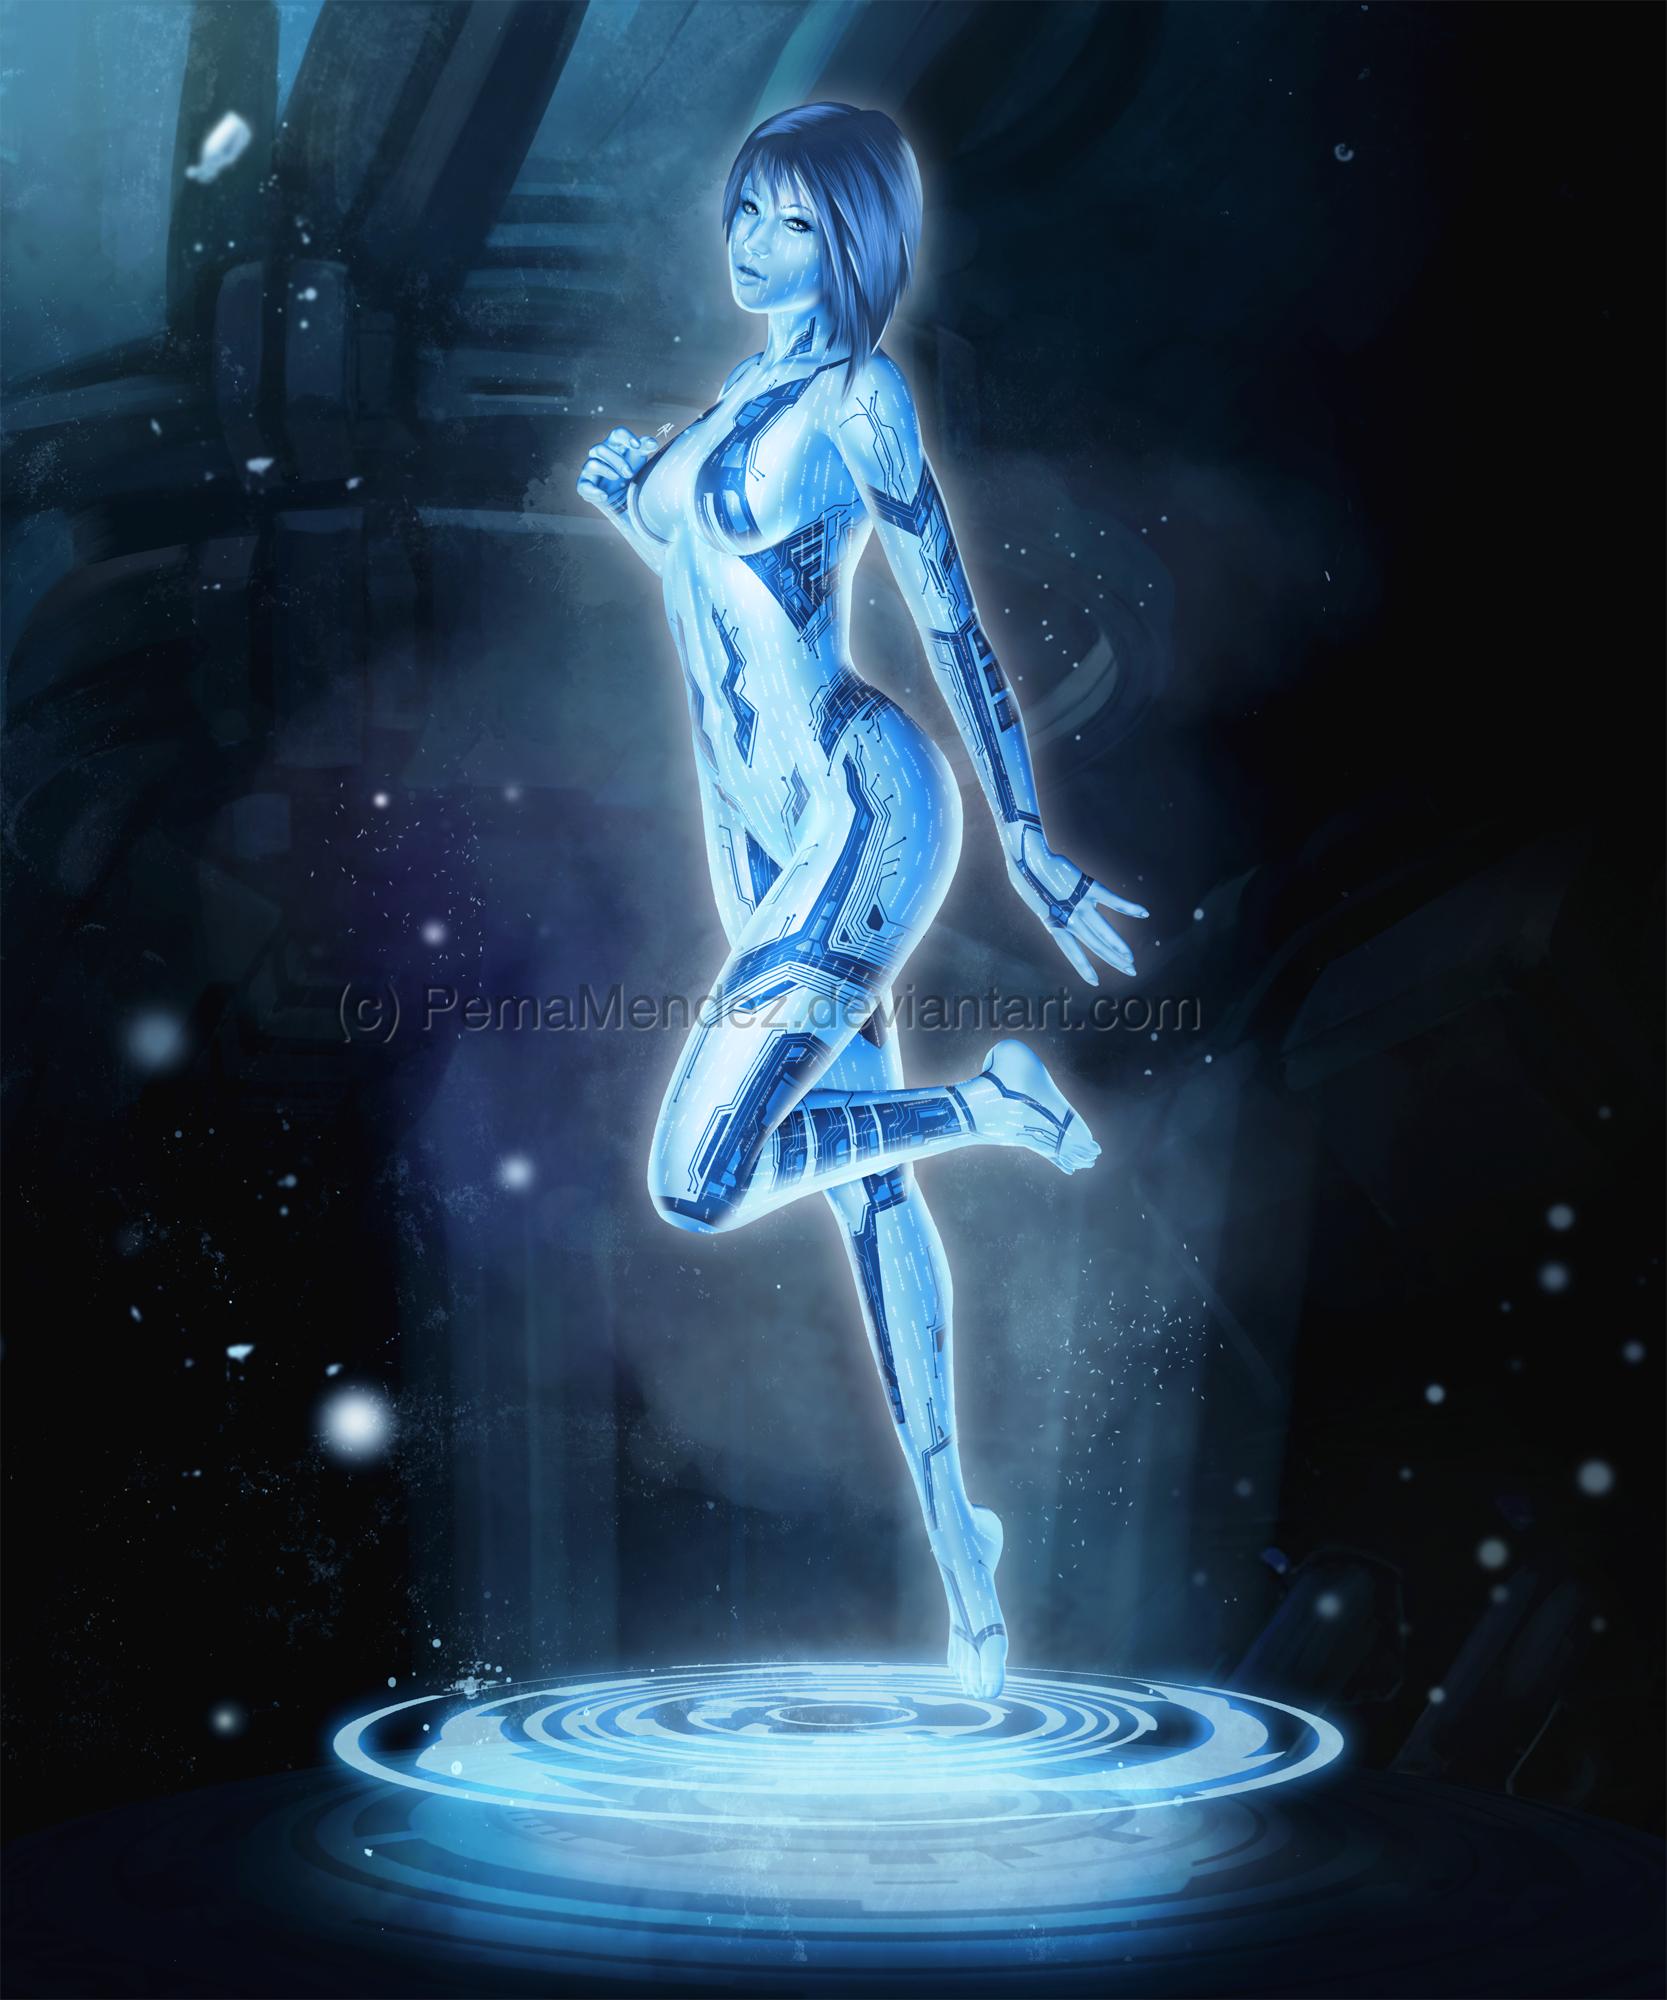 Cortana nude pics naked thumbs